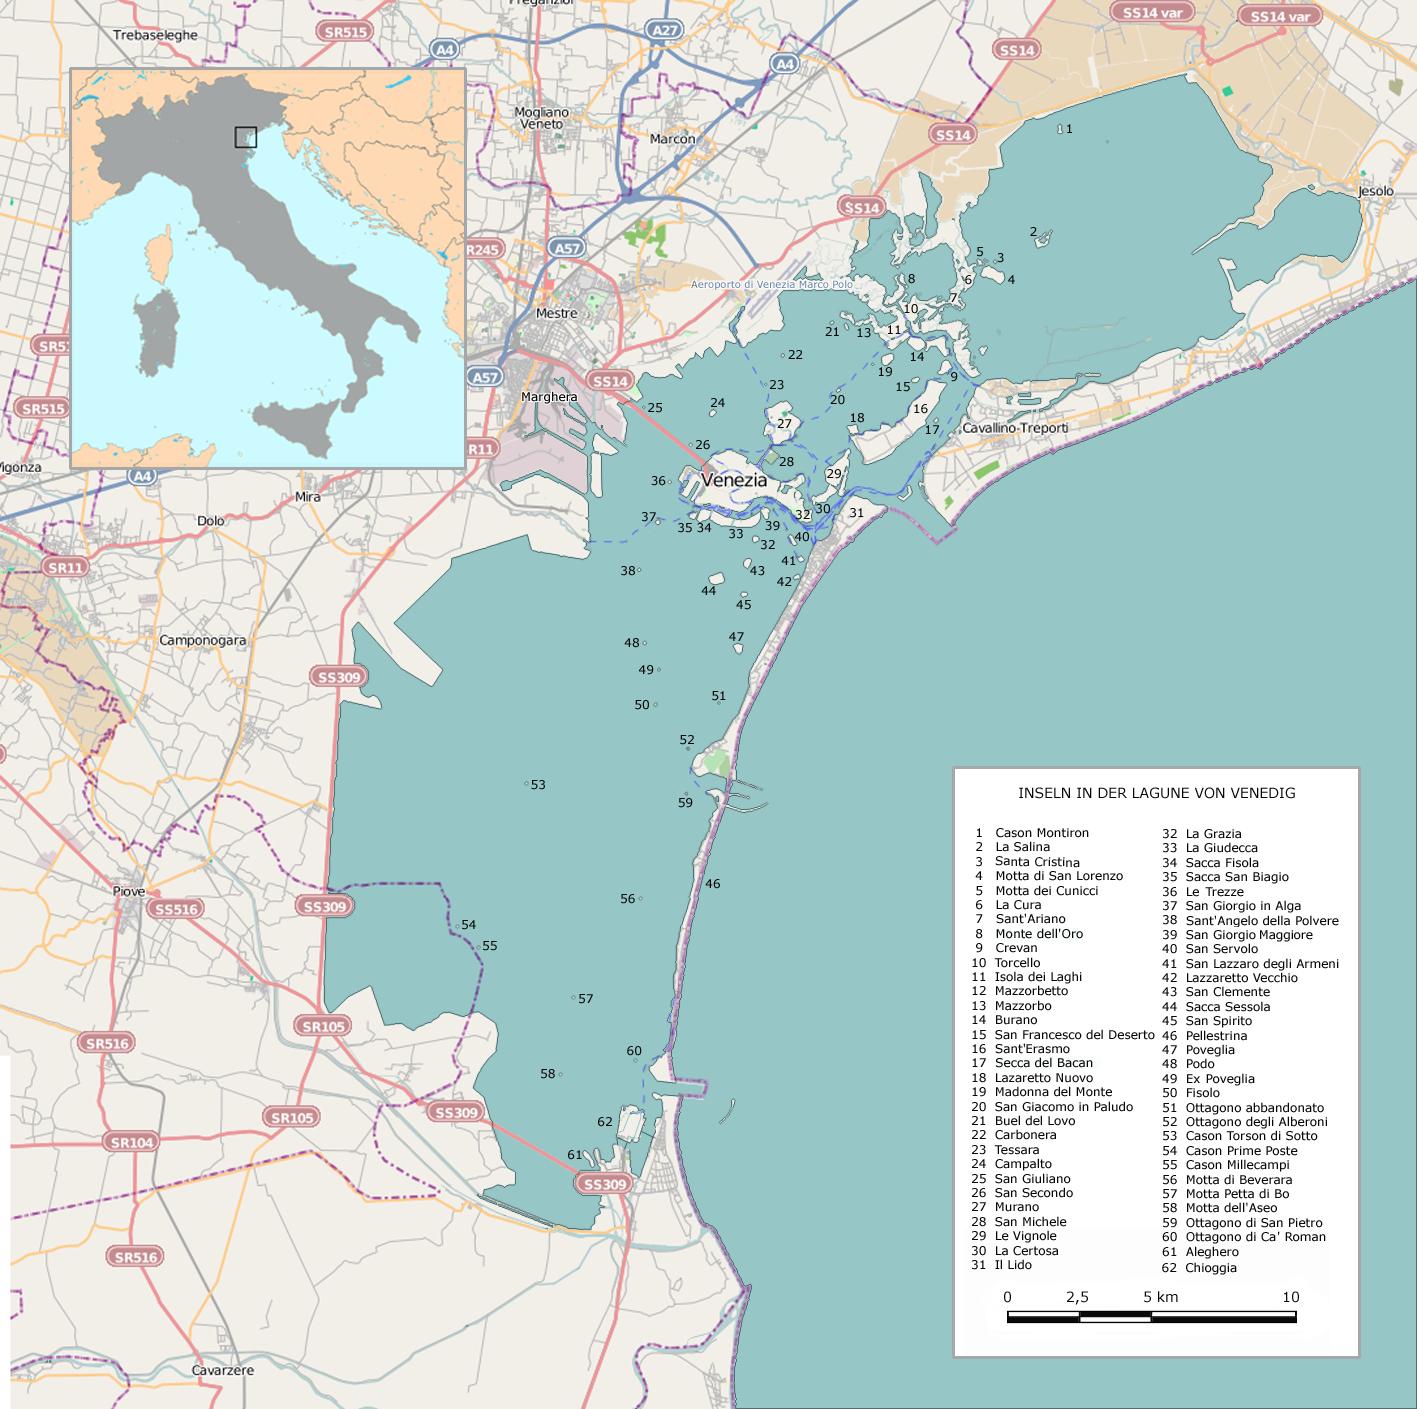 Venedig Karte.Lagune Von Venedig Wikipedia